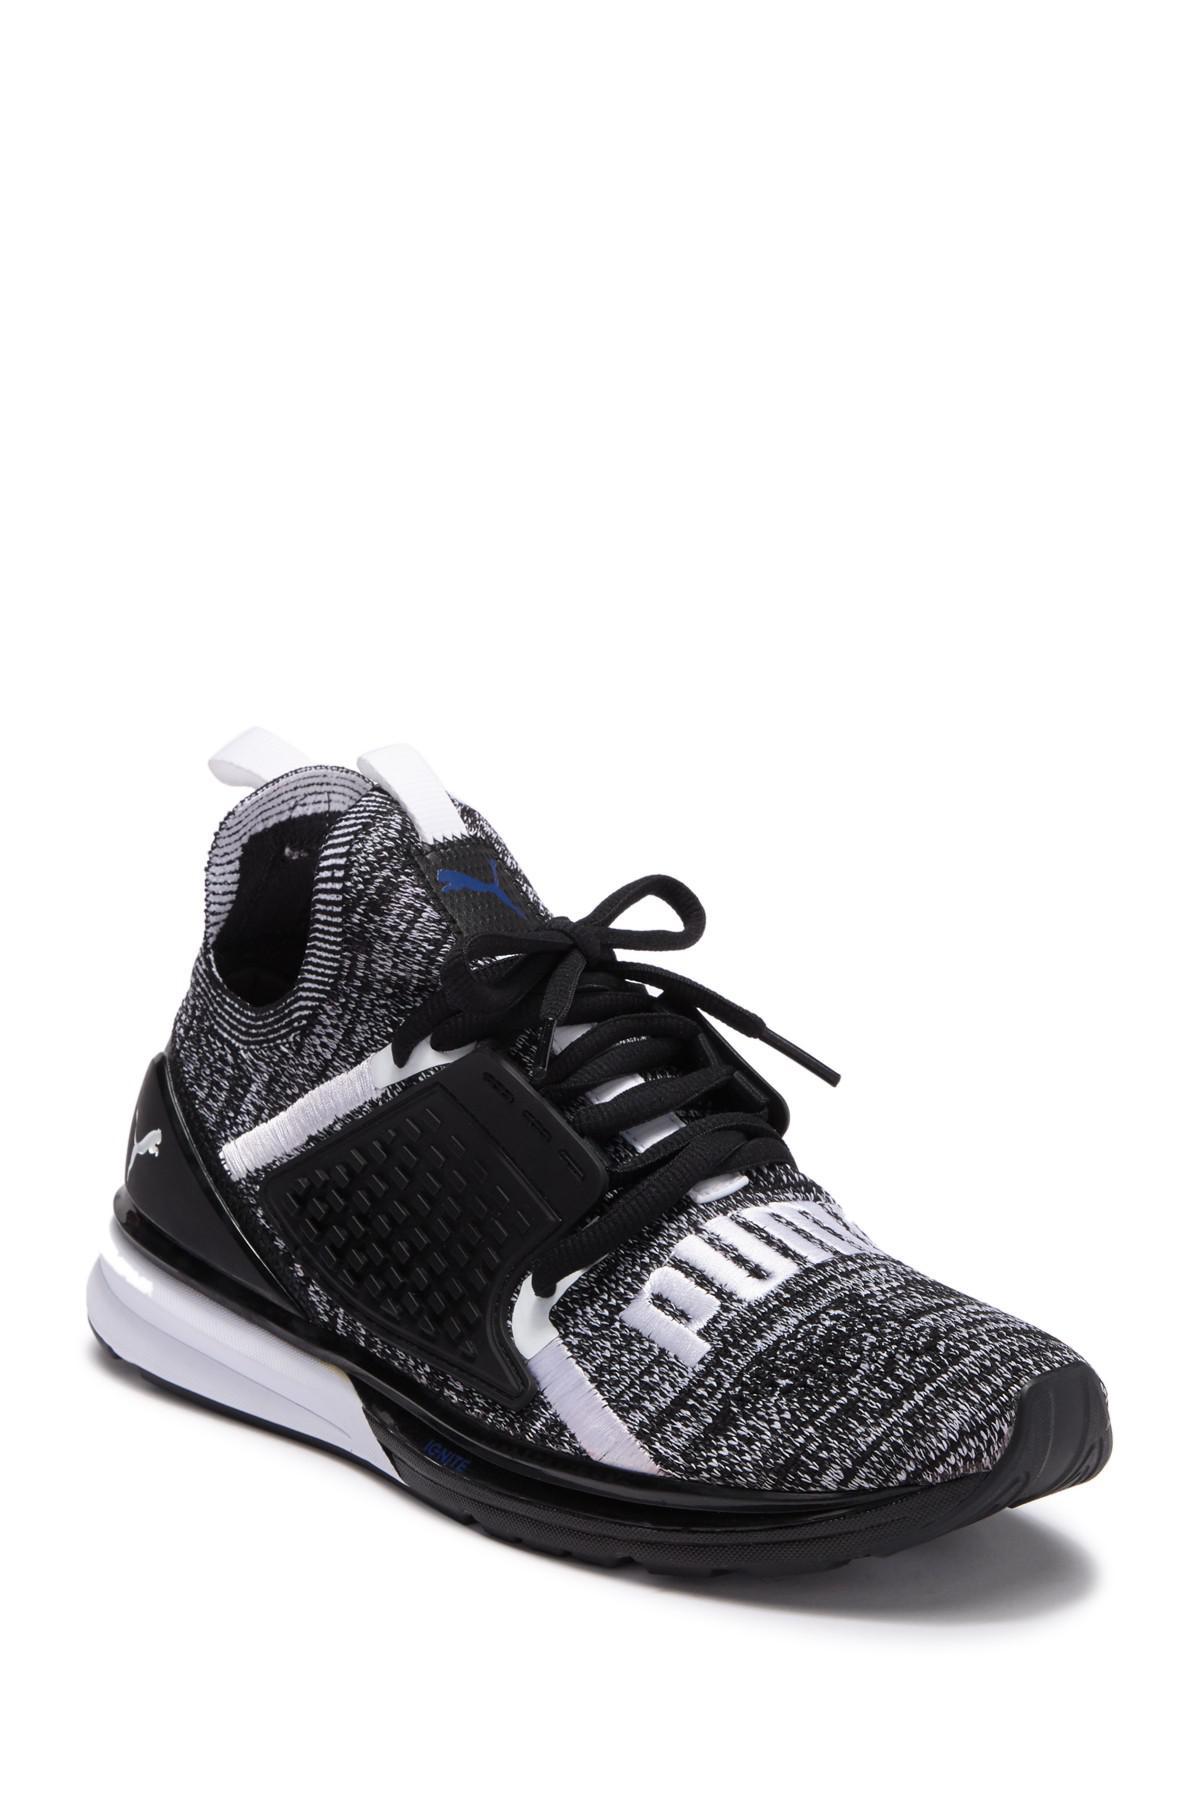 Ignite Limitless 2 Evoknit Sneaker